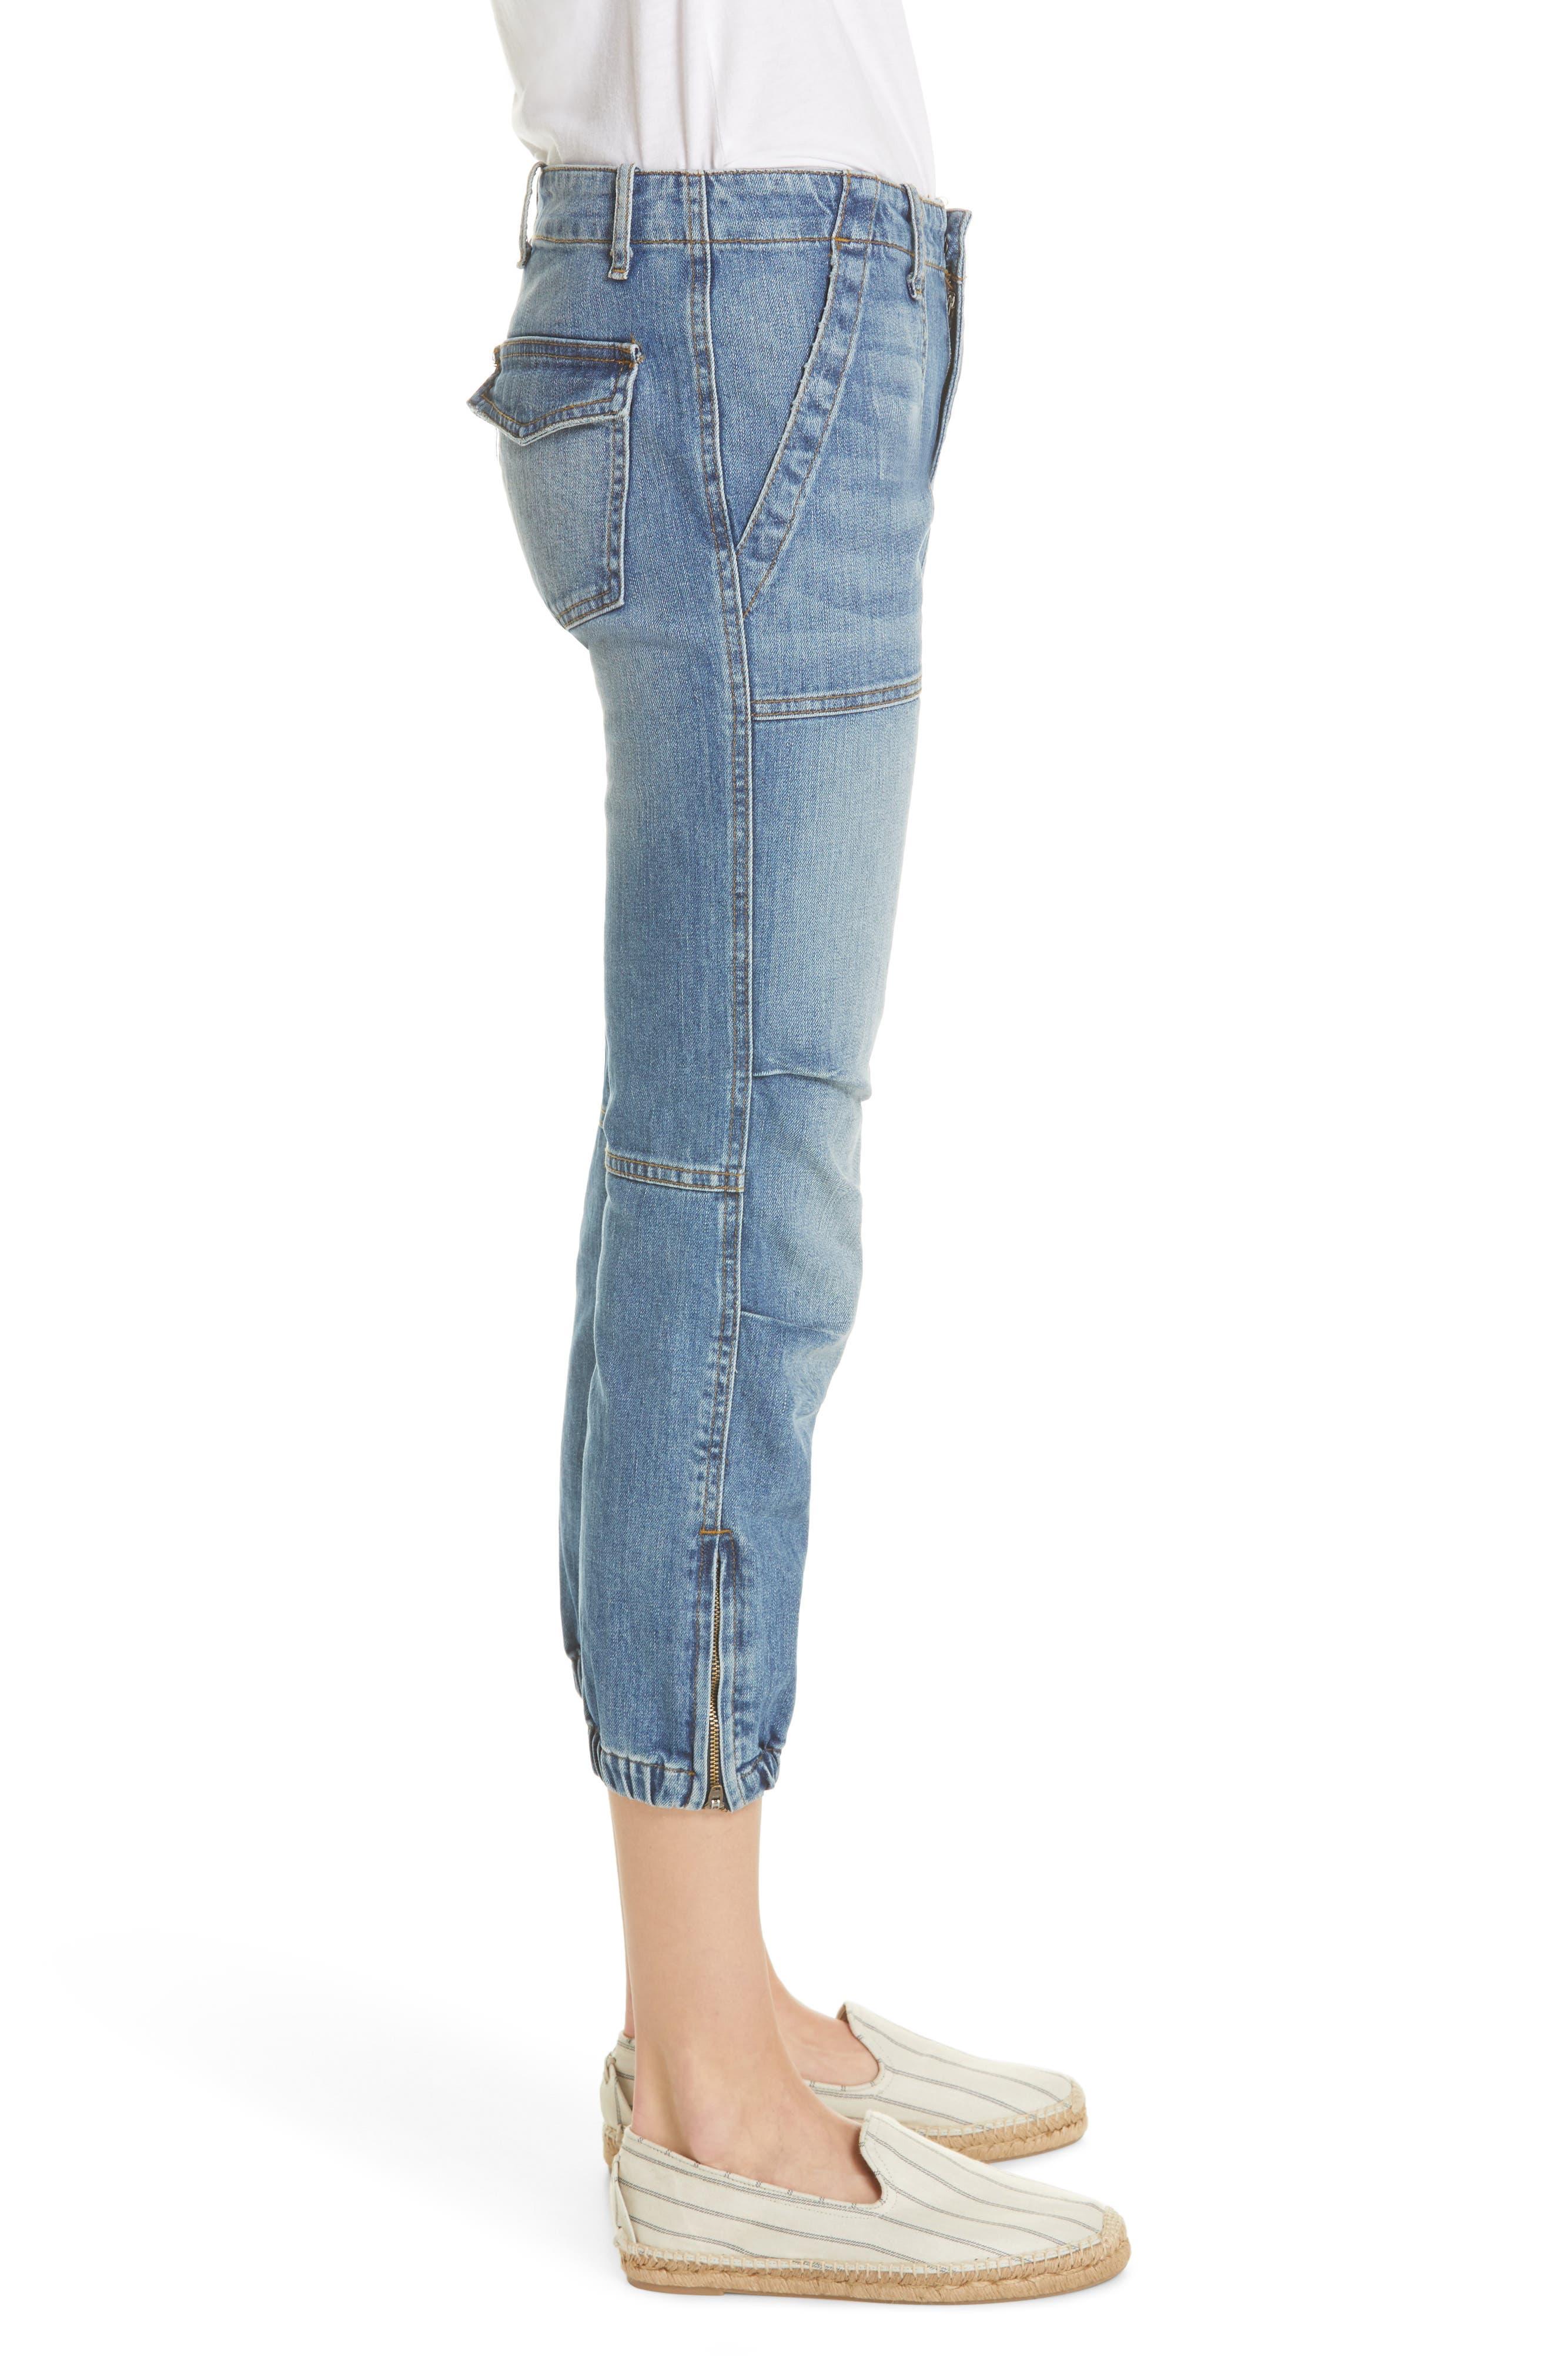 NILI LOTAN, Crop French Military Jeans, Alternate thumbnail 4, color, DUANE WASH